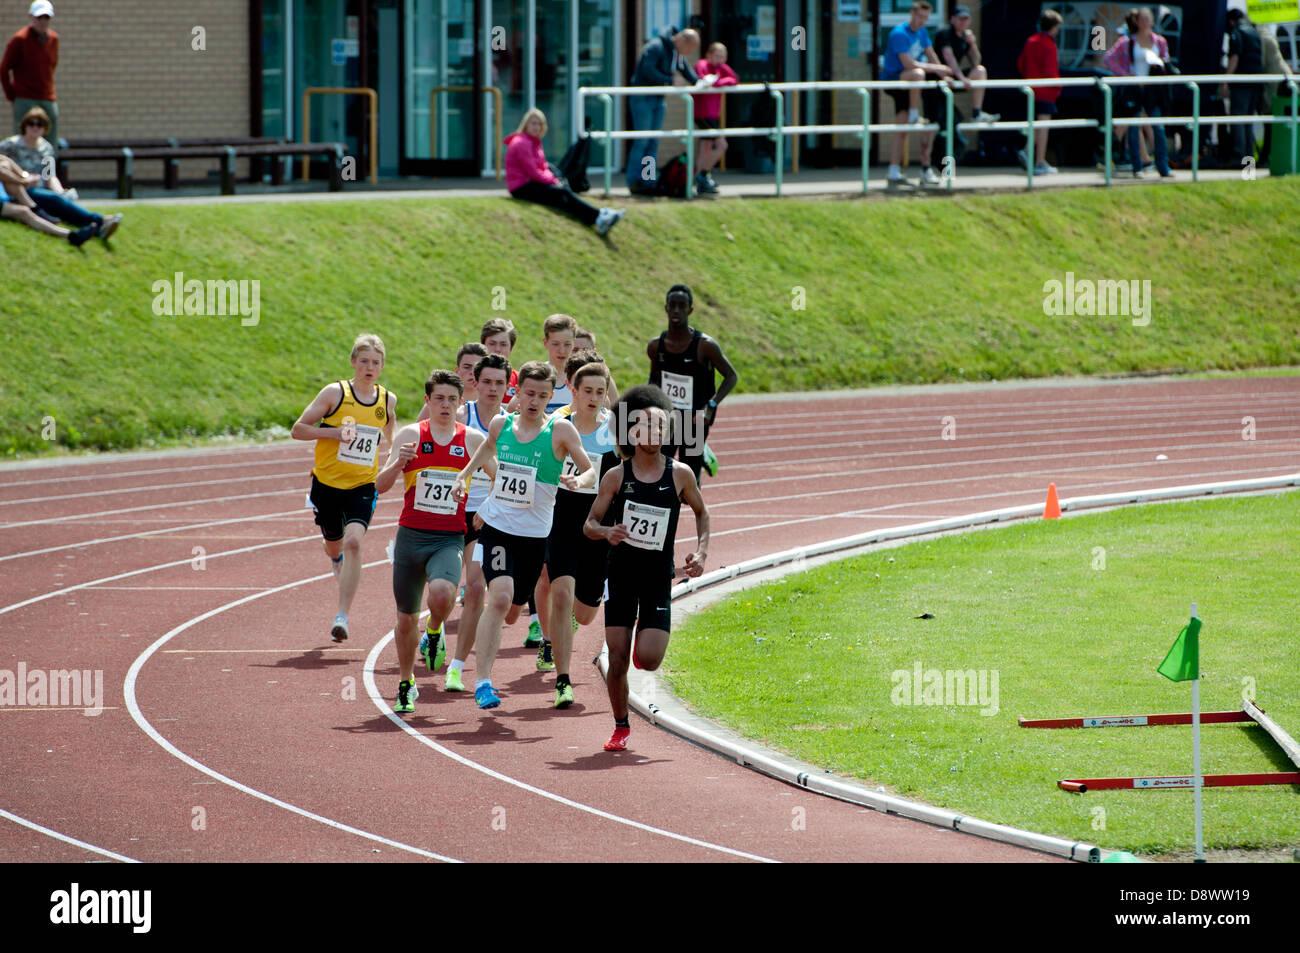 Athletics, teenage boys middle-distance race. - Stock Image